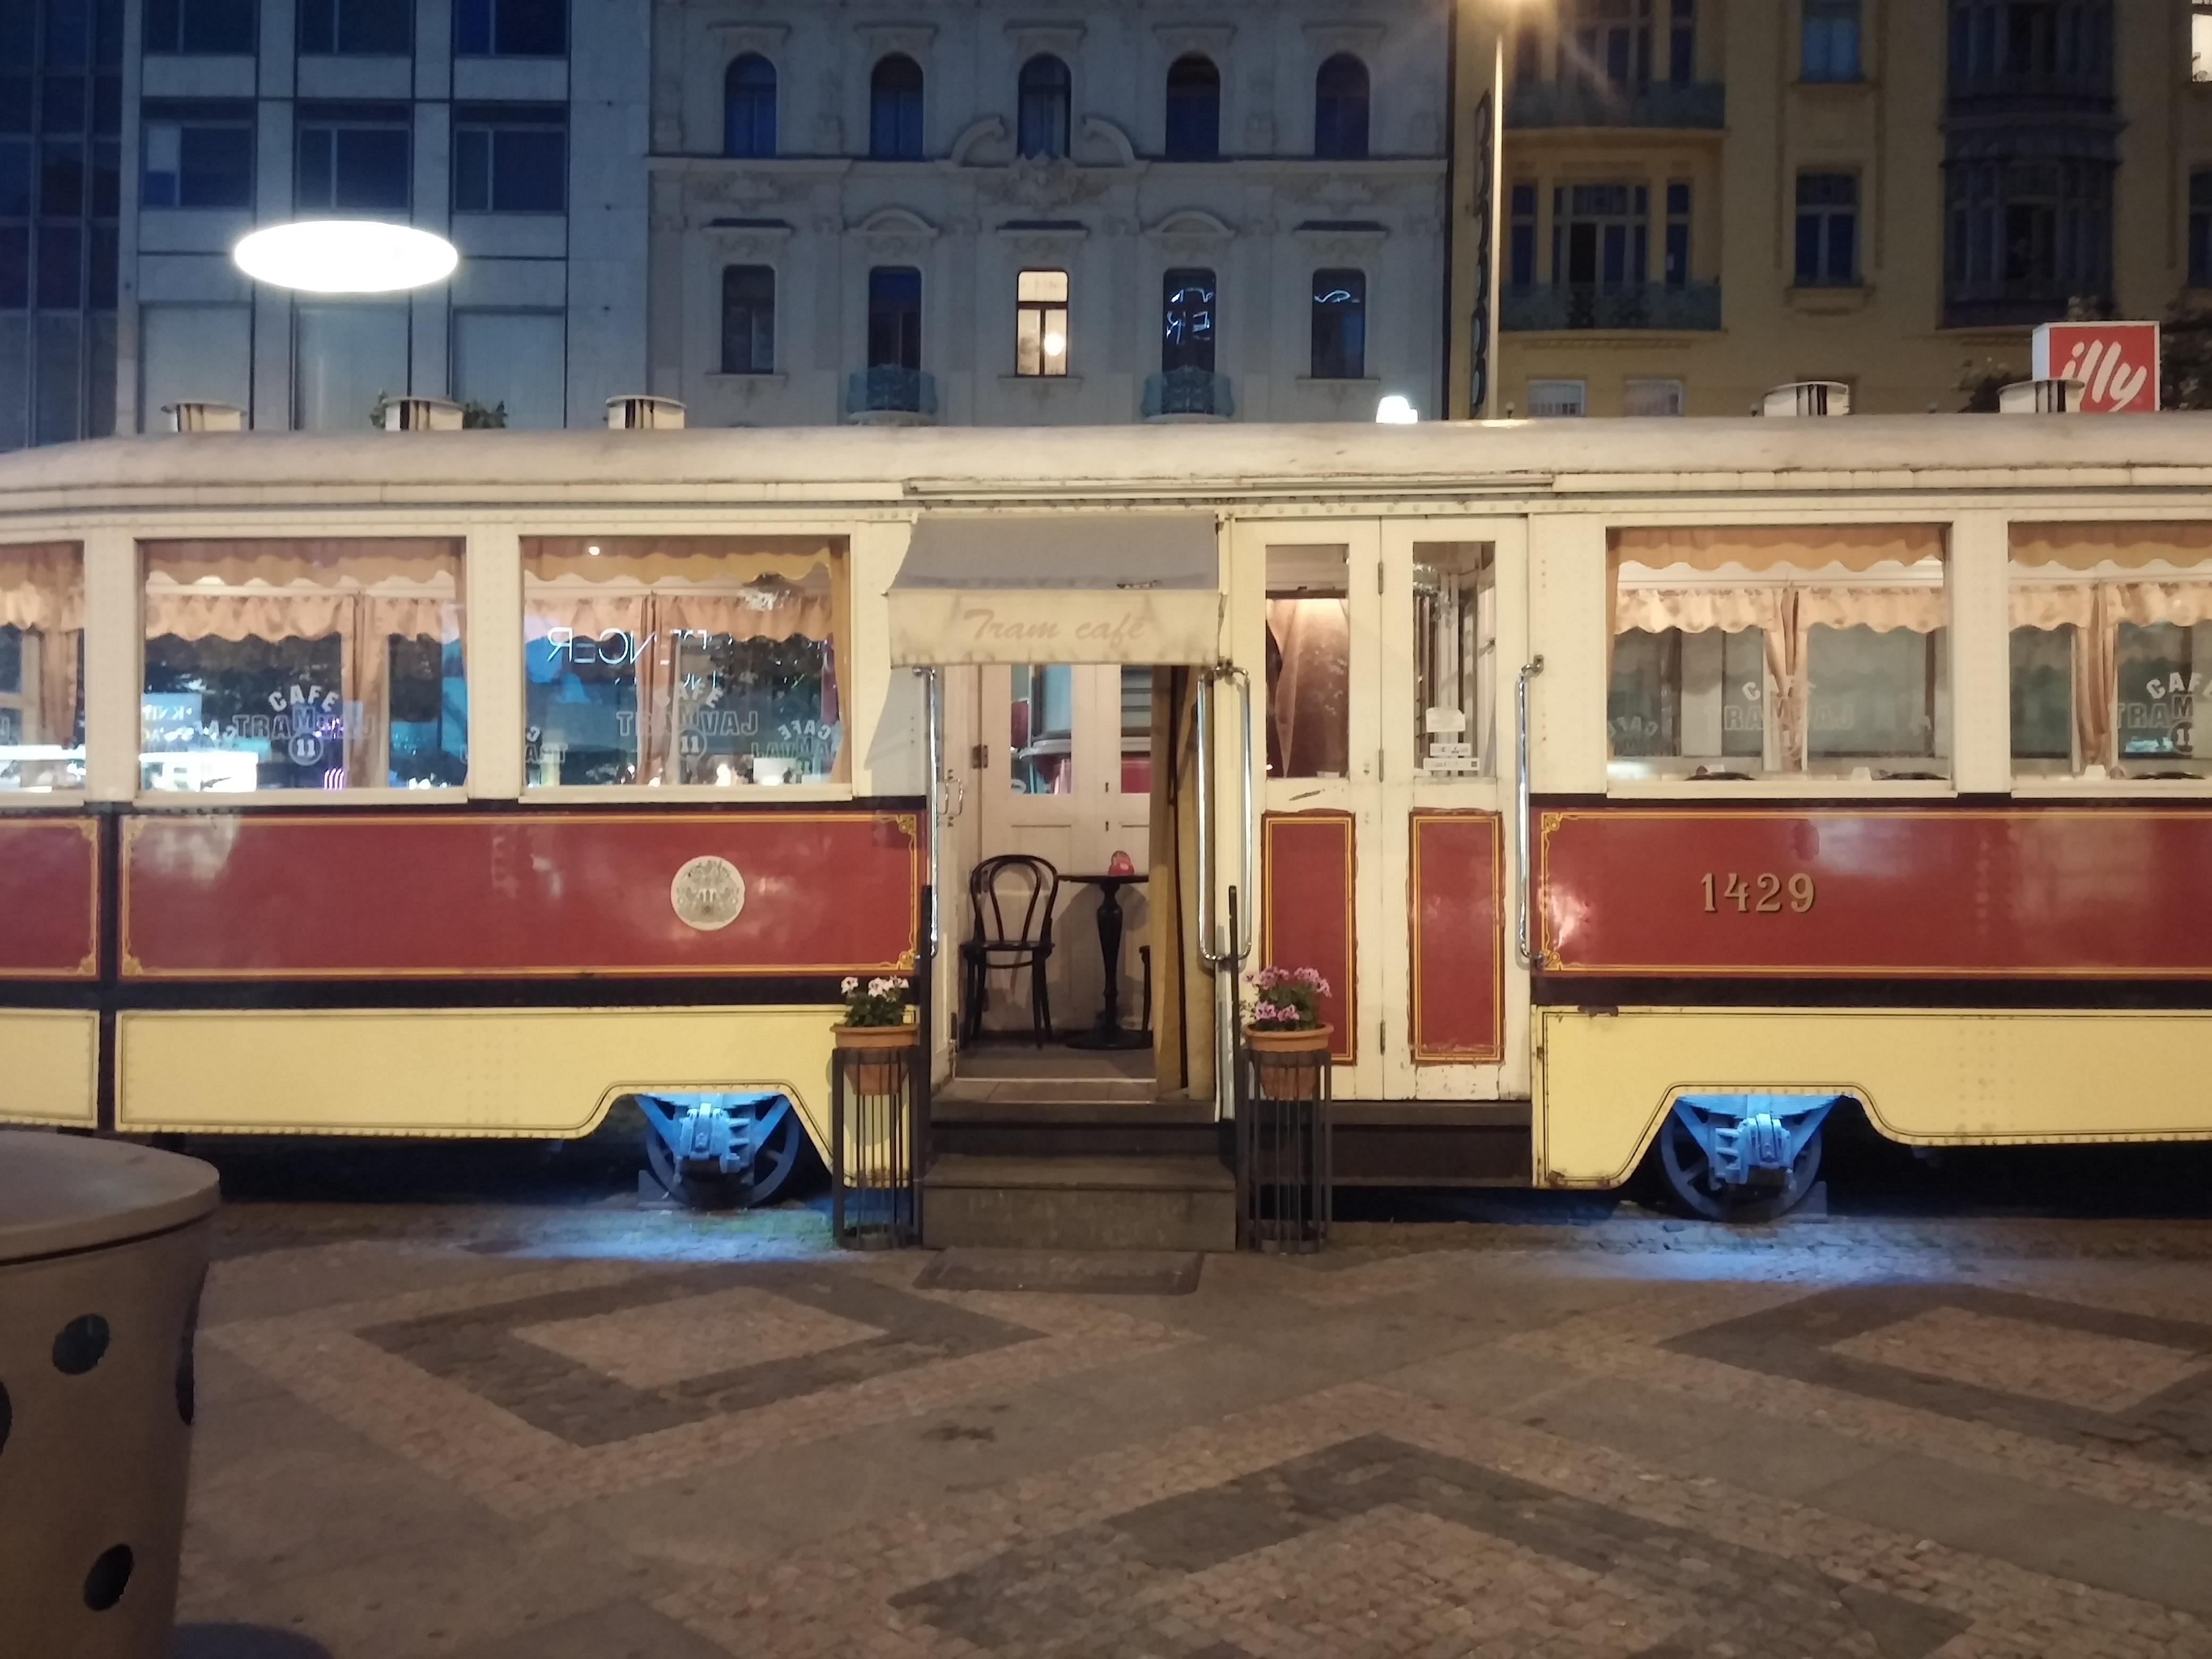 20170627_Piazza S Venceslao (3)